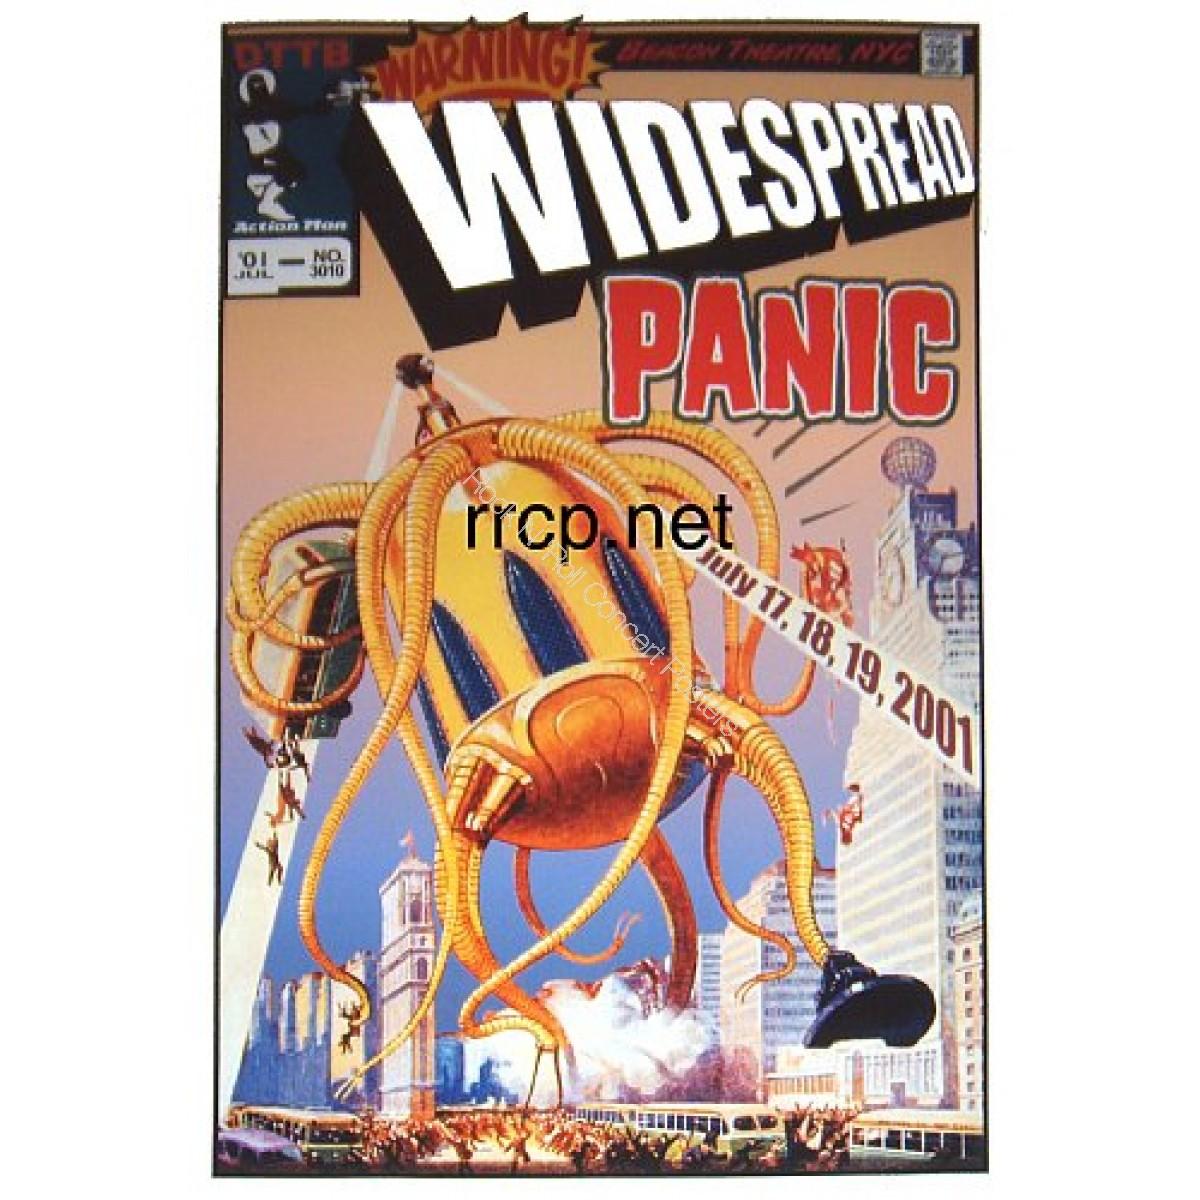 Widespread Panic Beacon Theatre NYC 6/17-19/01